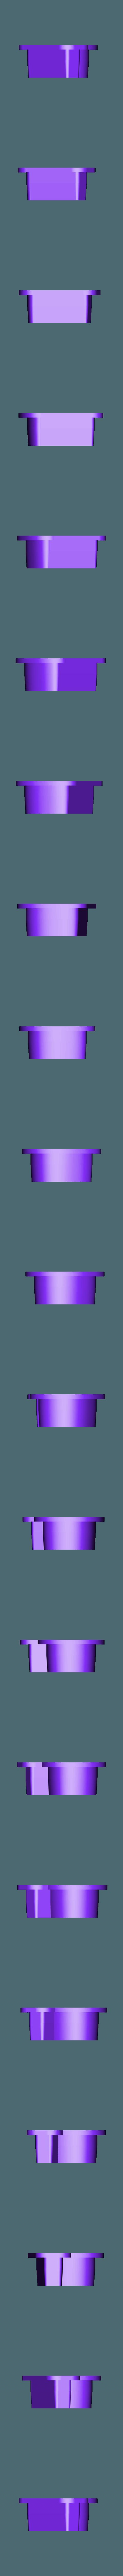 BLEU petit P.STL Download STL file Patrol Punch (Paw Patrol) • 3D print object, Chris-tropherIlParait